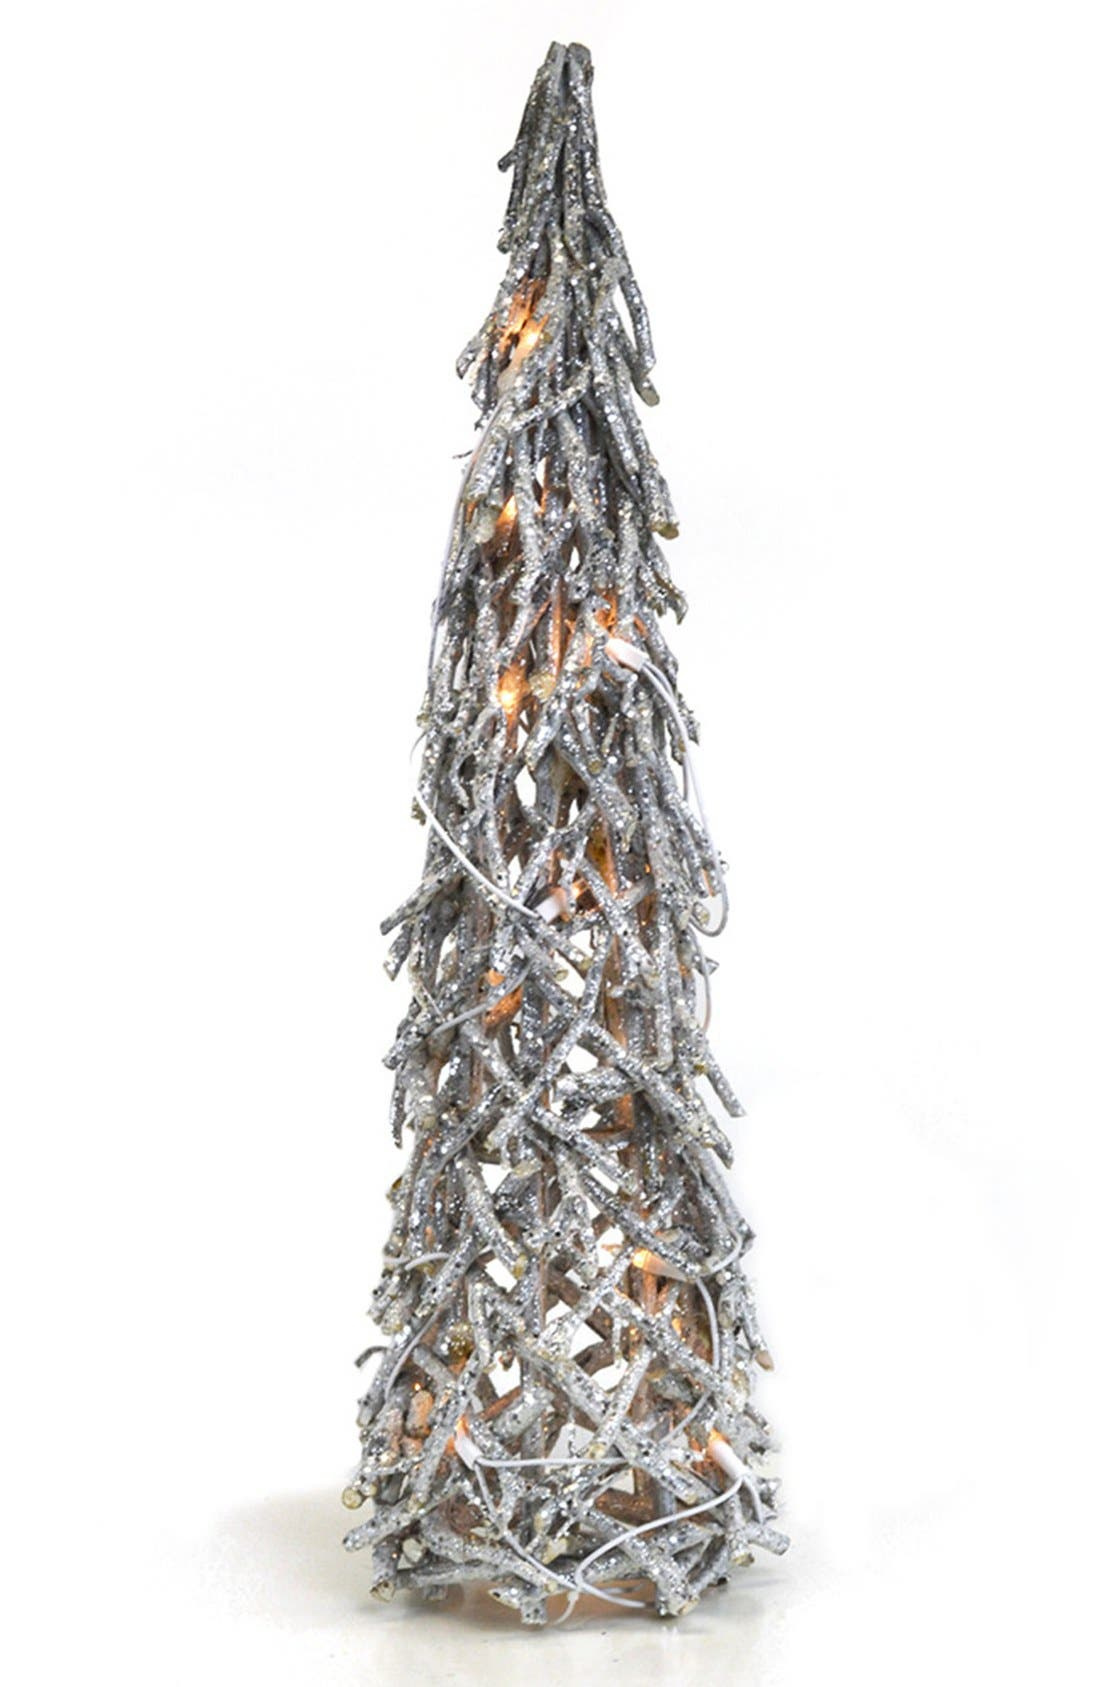 Main Image - Shea's Wildflower Lighted Cone Tree